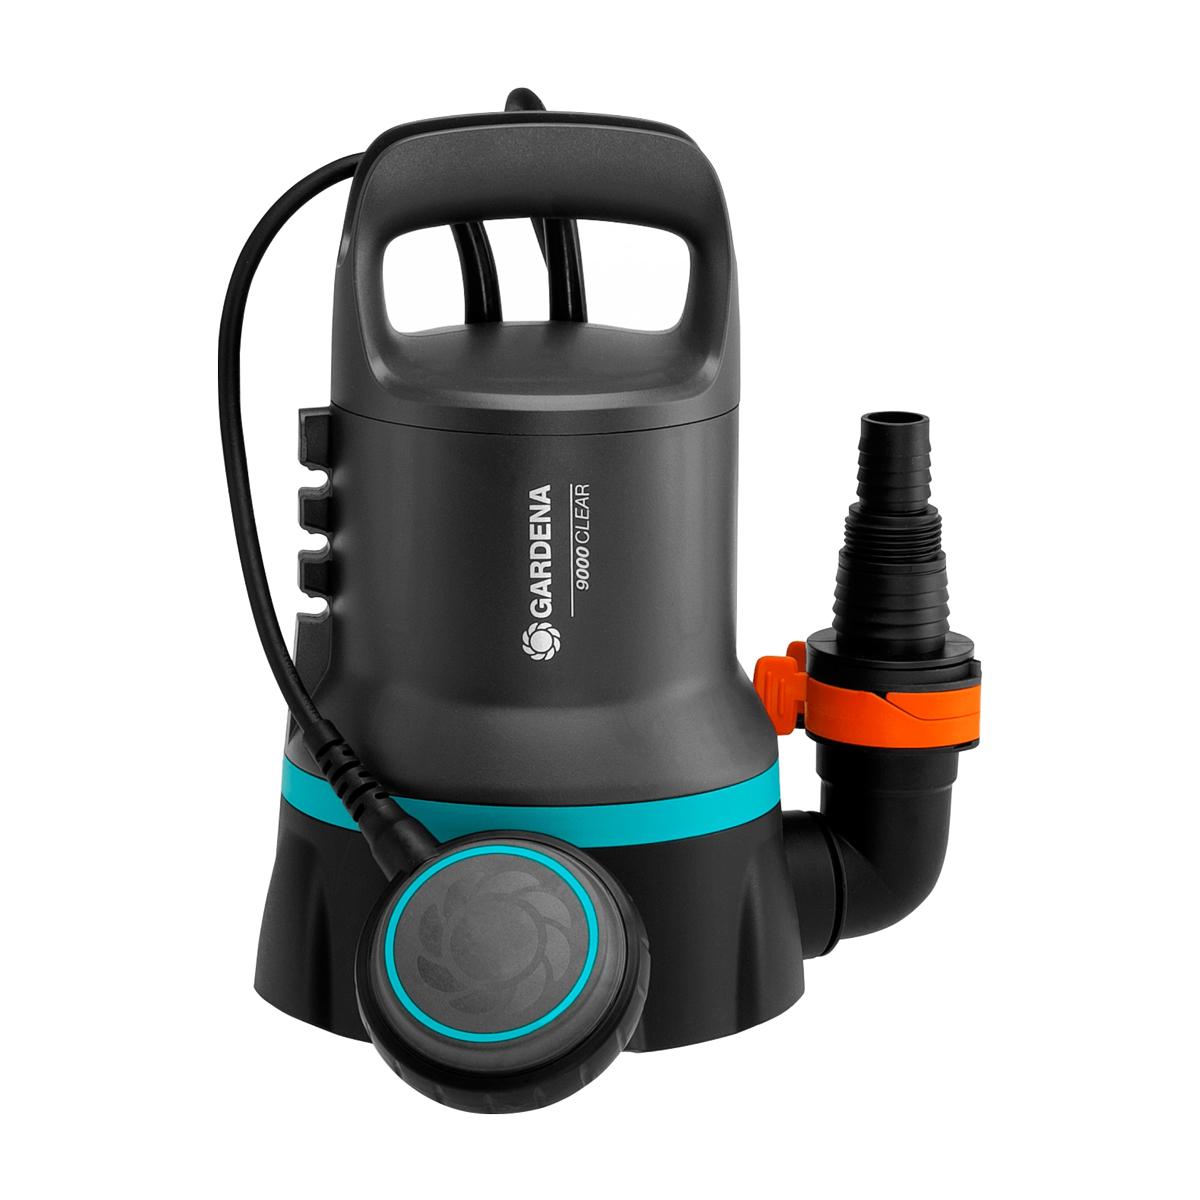 Gardena submersible pump 9000 9030-20